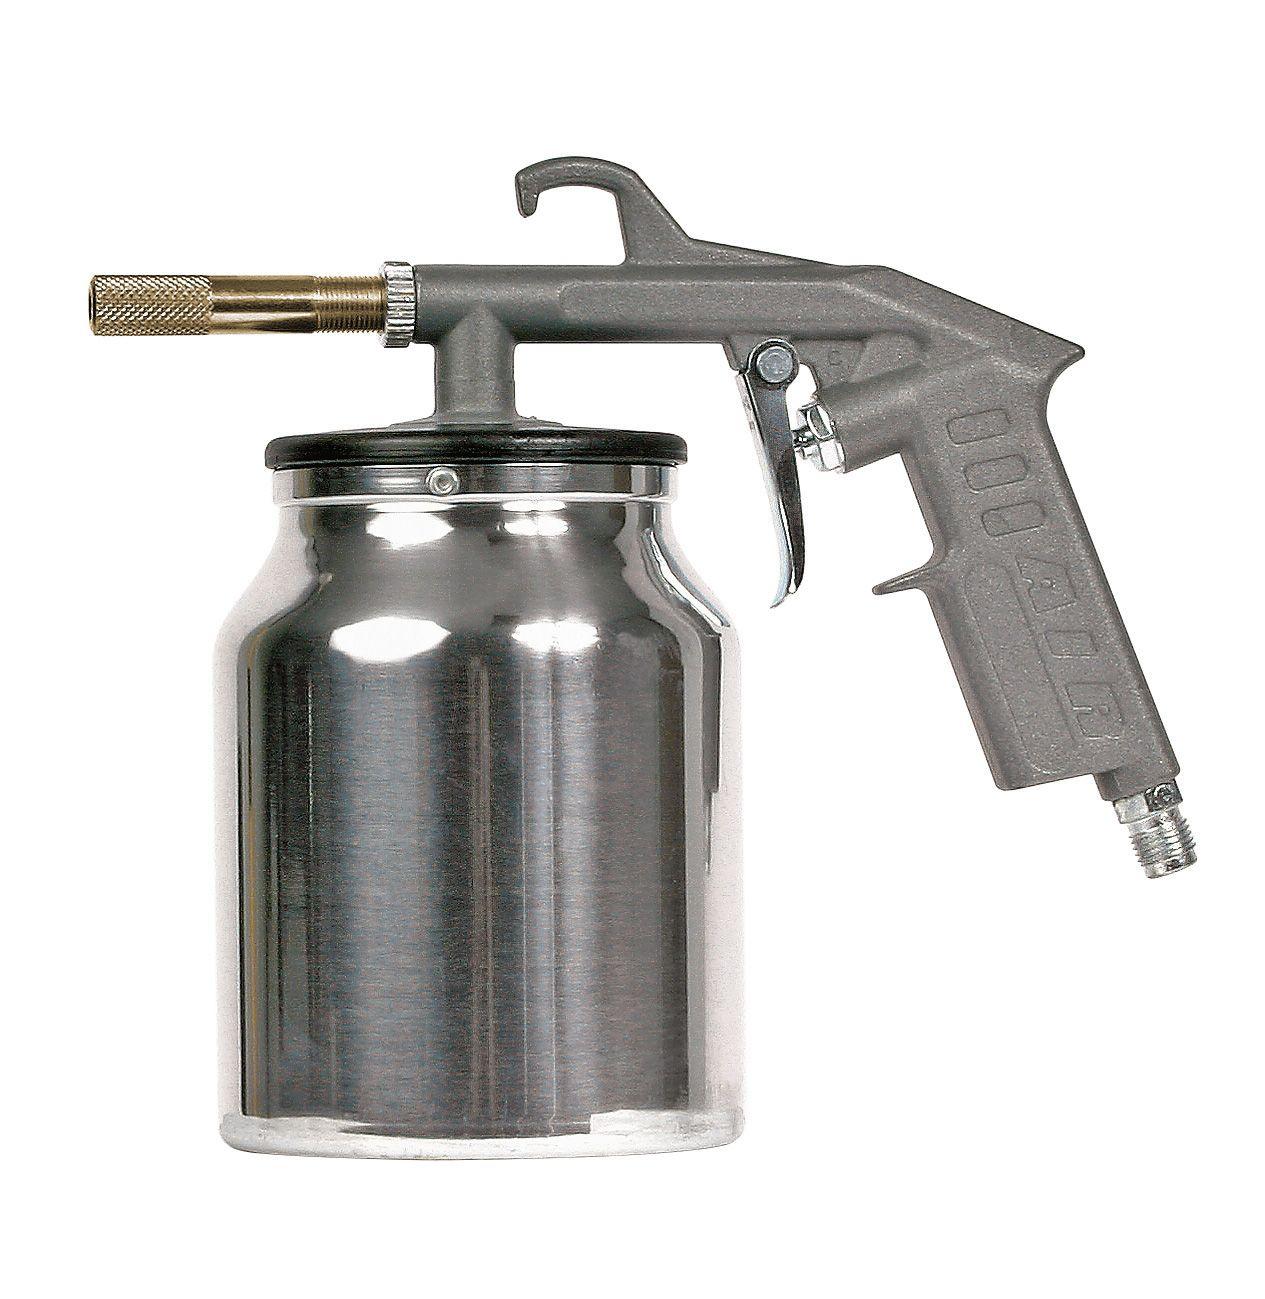 SIP Maxi Blast Sand Blasting Gun